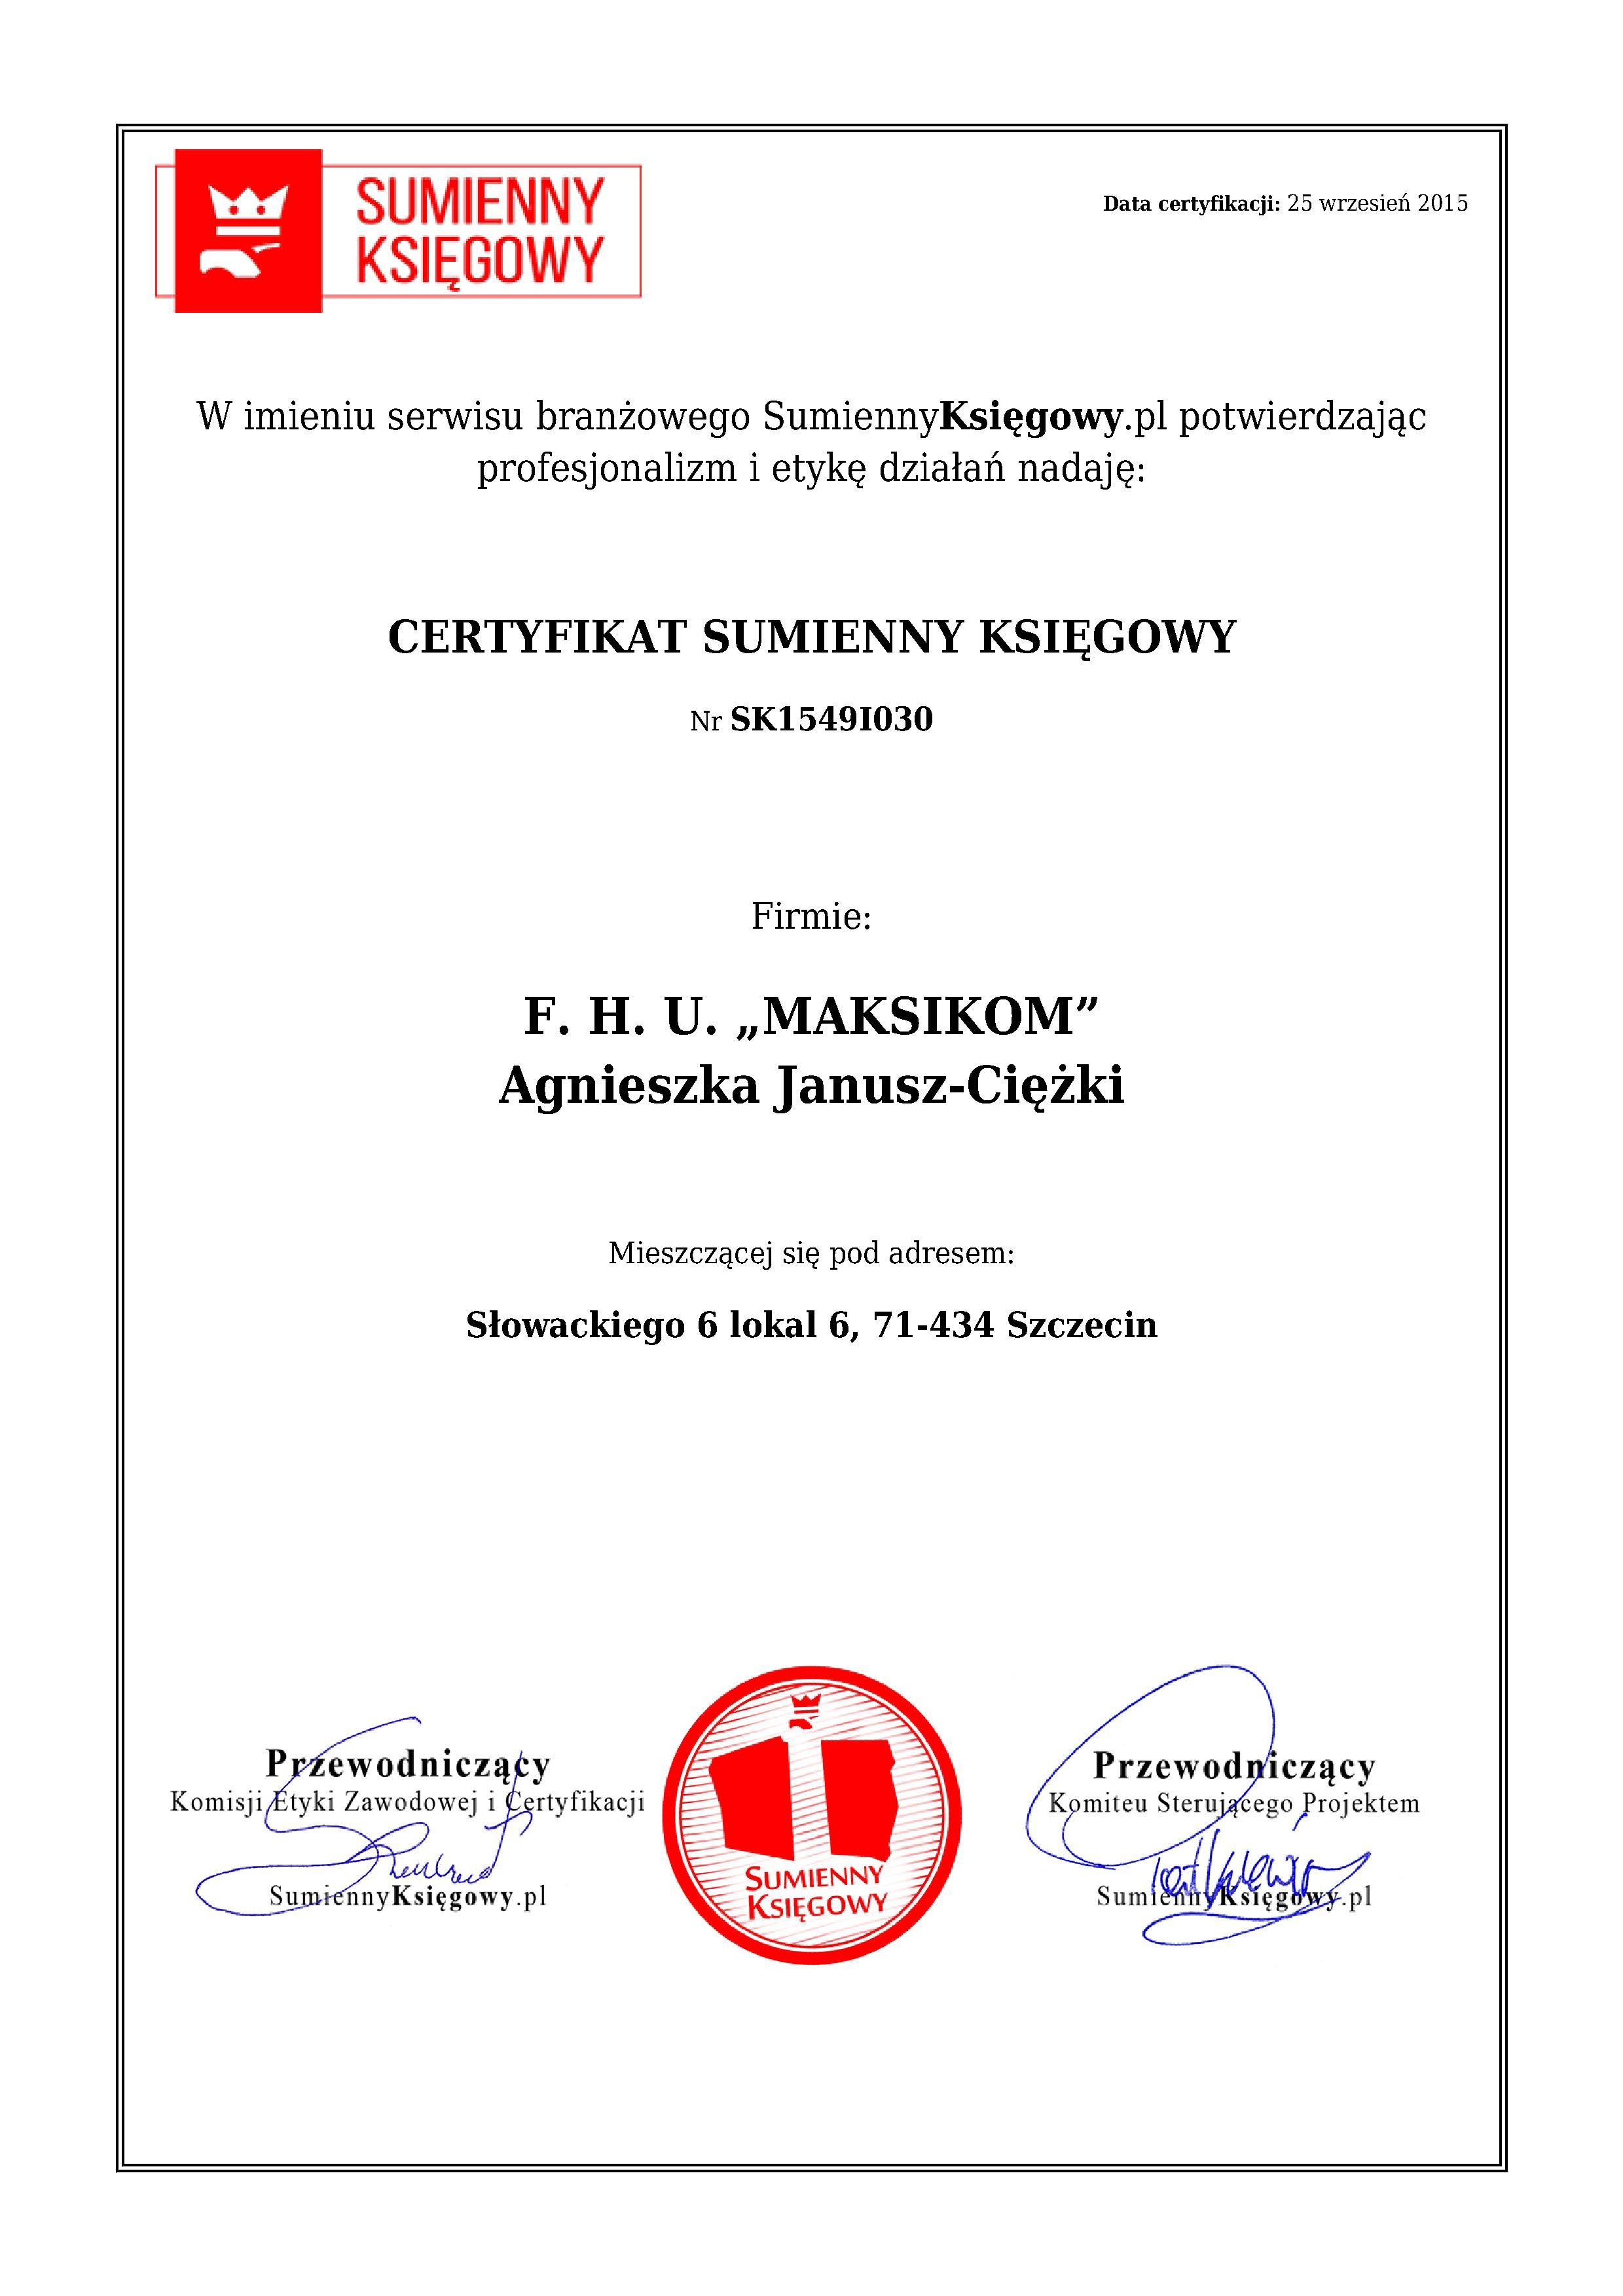 "Certyfikat F. H. U. ""MAKSIKOM"" Agnieszka Janusz-Ciężki"